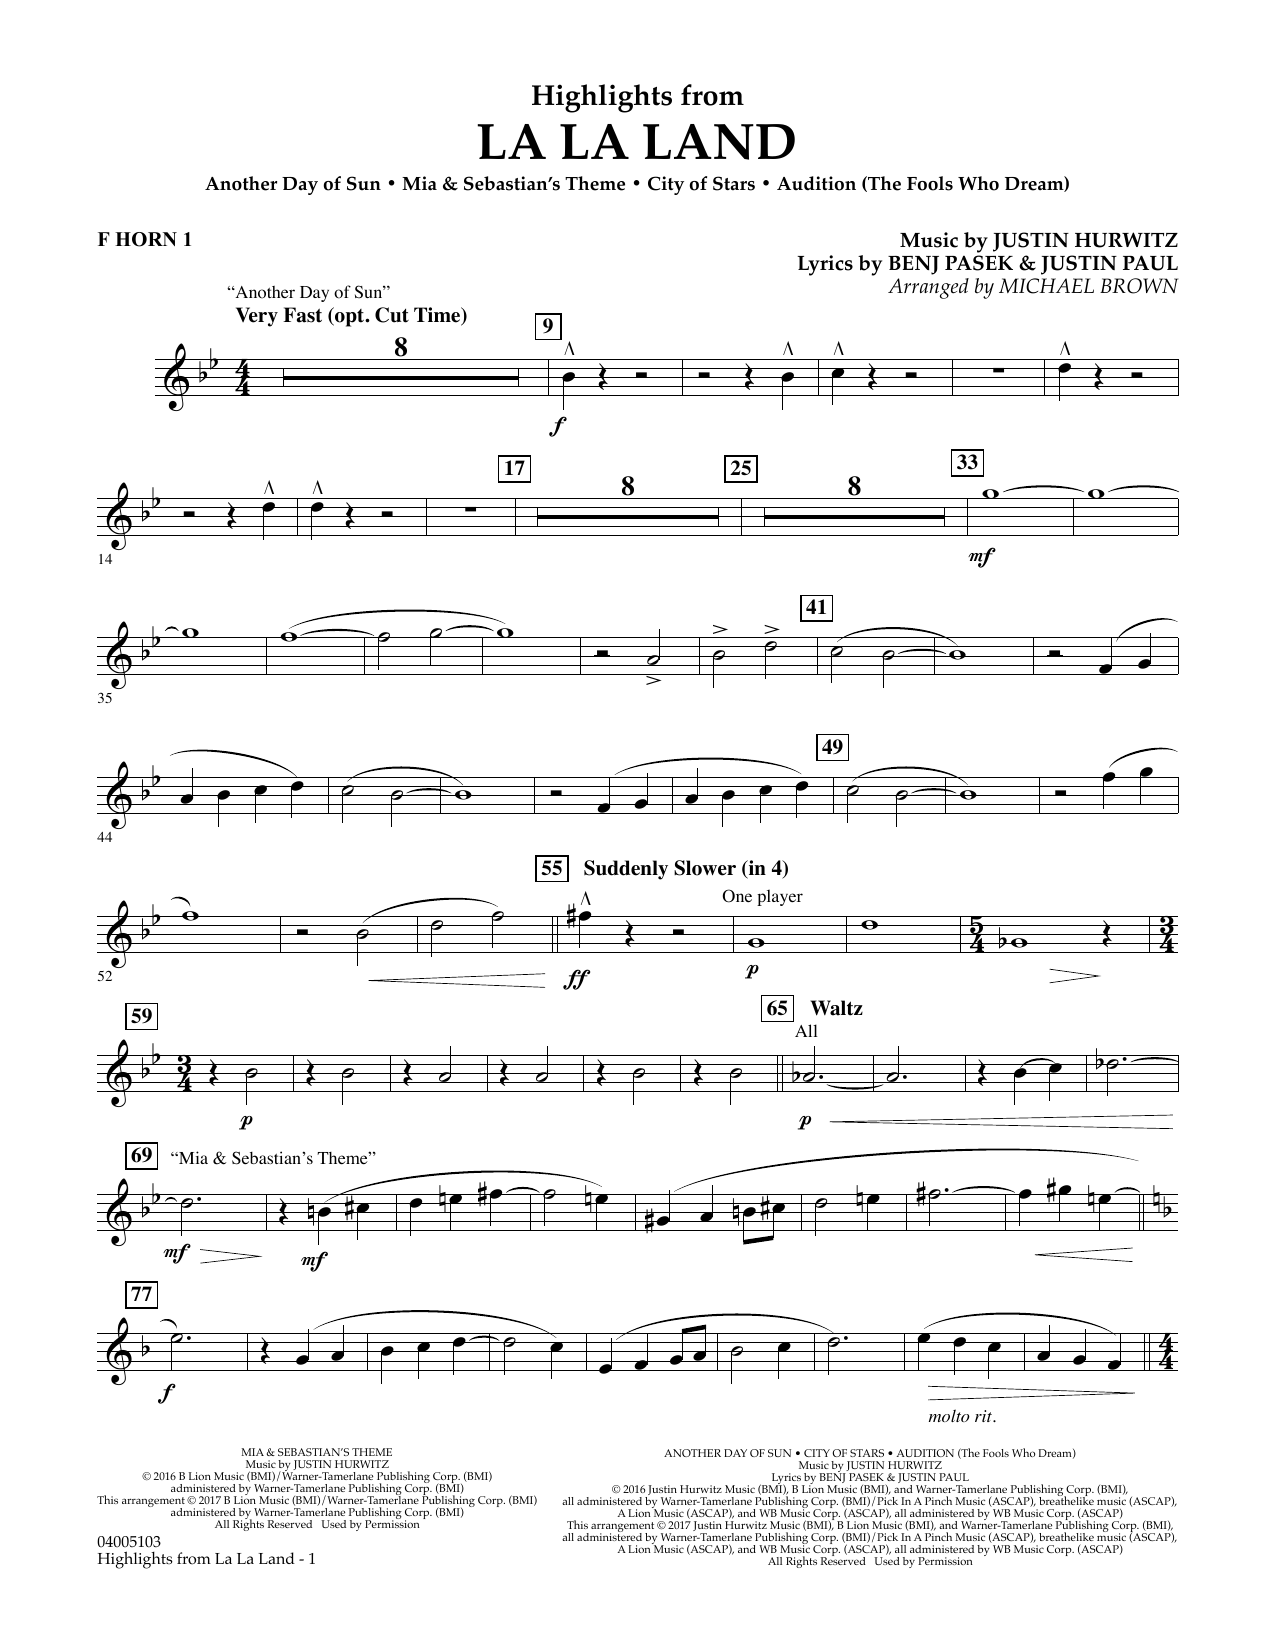 Highlights from La La Land - F Horn 1 (Concert Band)